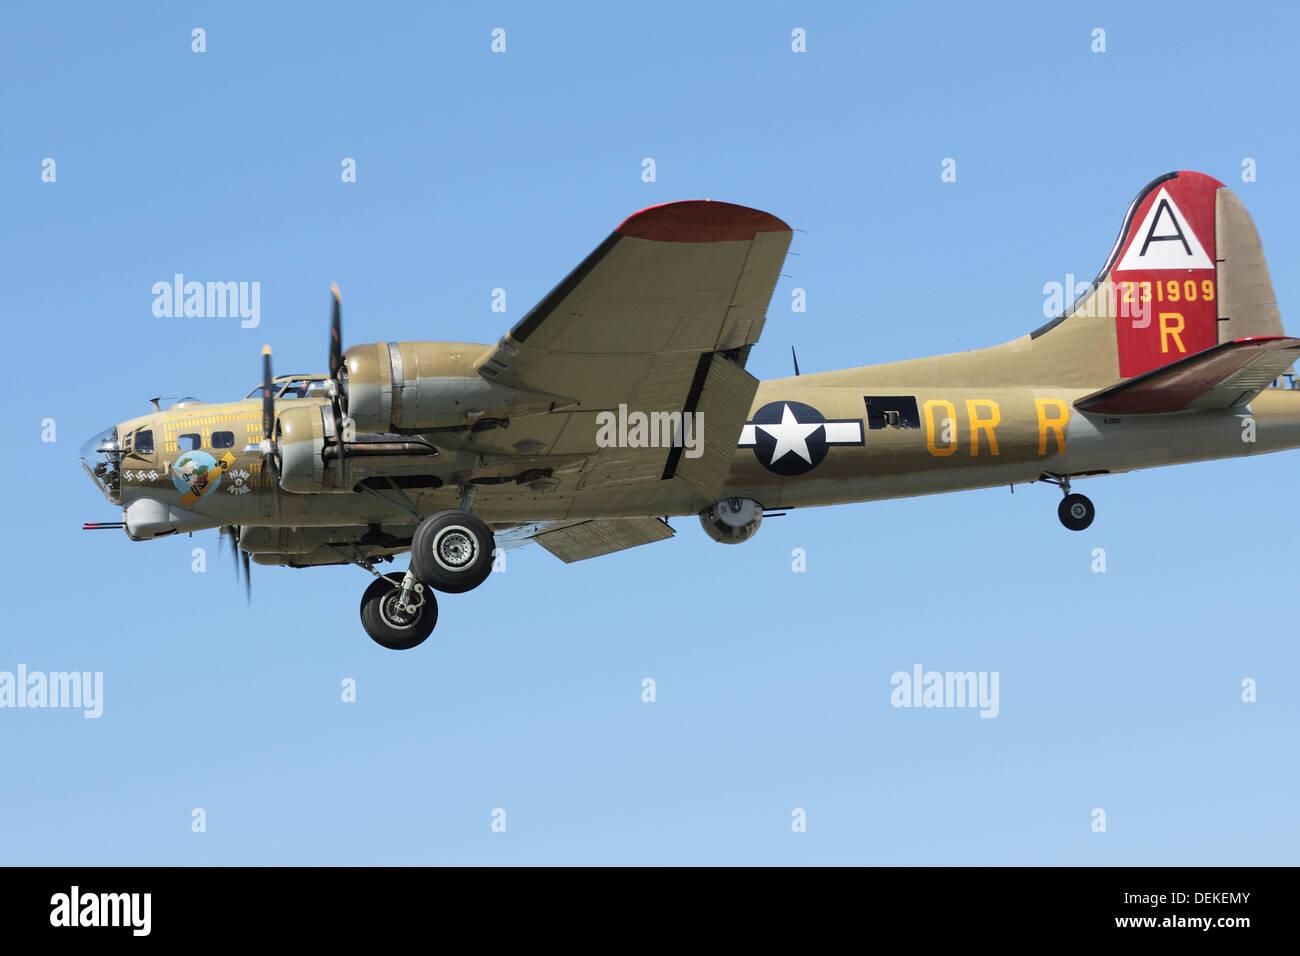 Restored B-17 WW2 Bomber Aircraft Stock Photo, Royalty ...